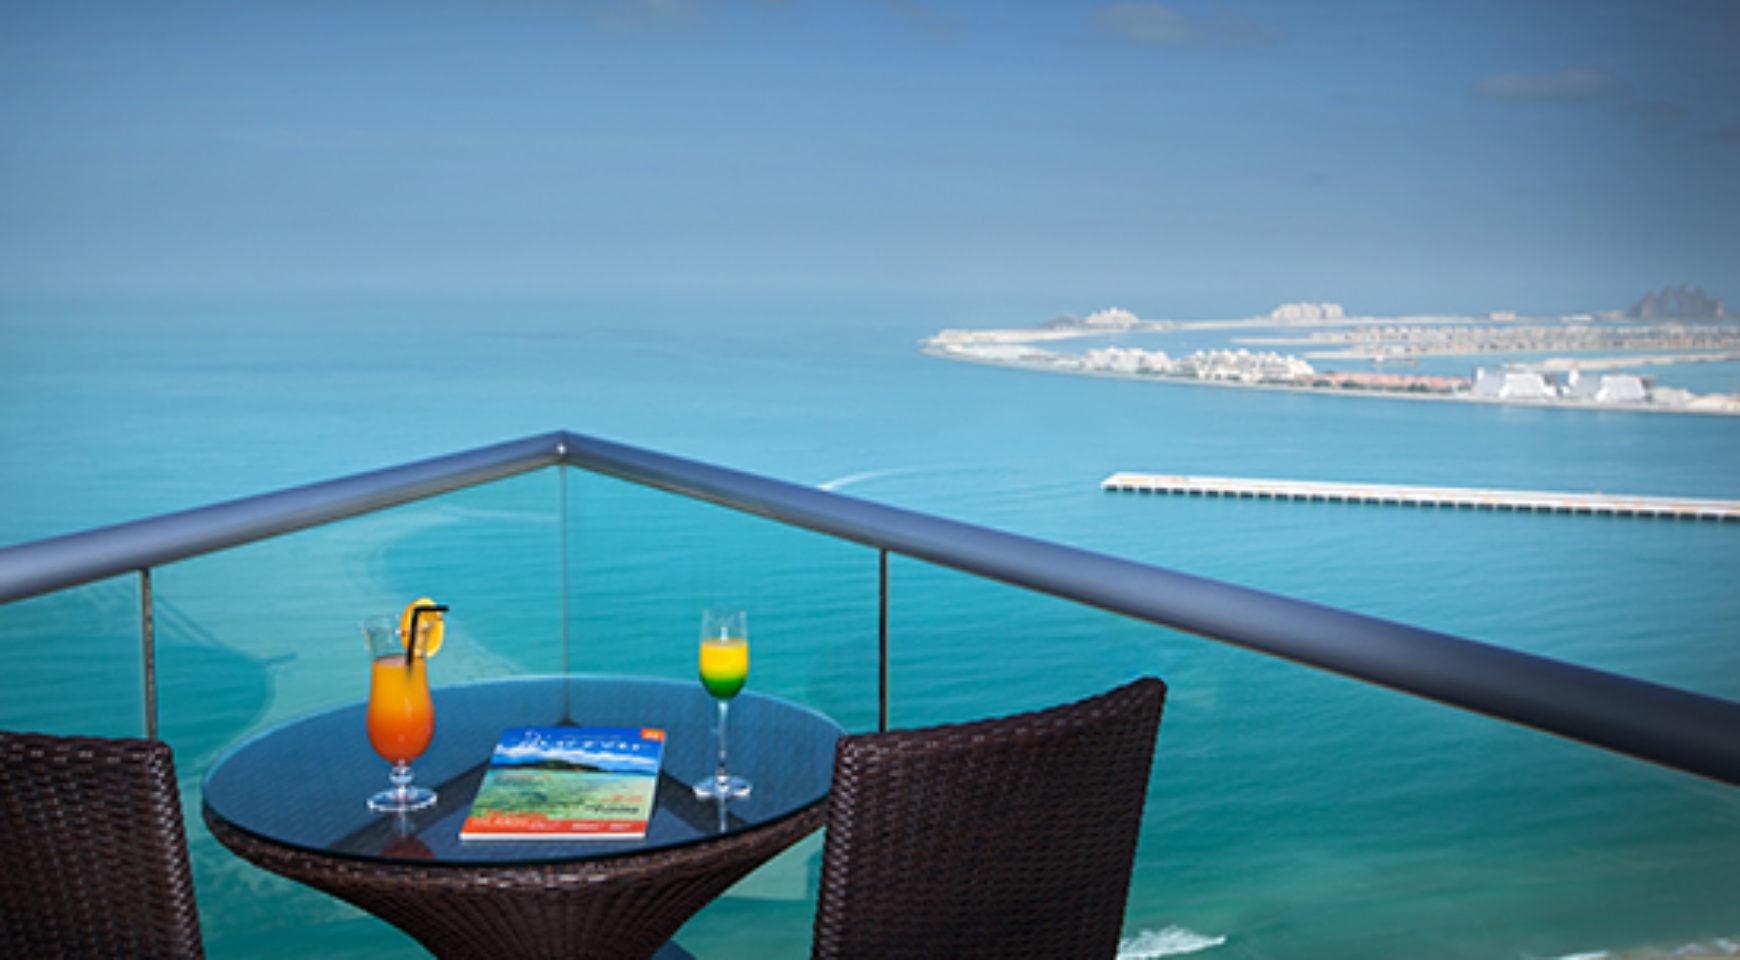 Ja Oasis Beach Tower Dubai Marina Share This Book Now Imacon Color Scanner